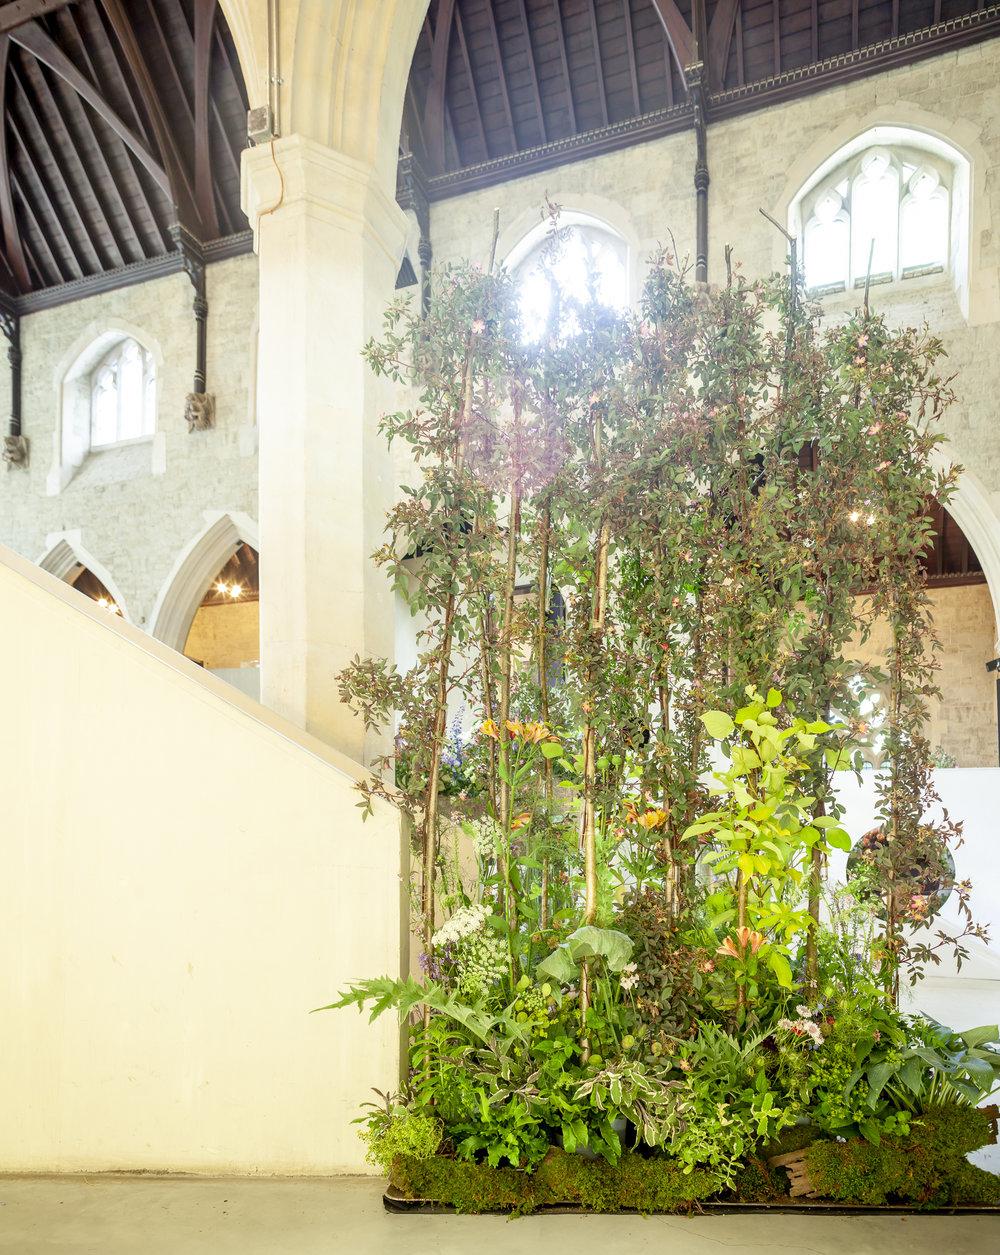 Harrys-Flowers-installation-British-Flowers-Week-2018-at-Garden-Museum-by-New-Covent-Garden-Market (5).jpg